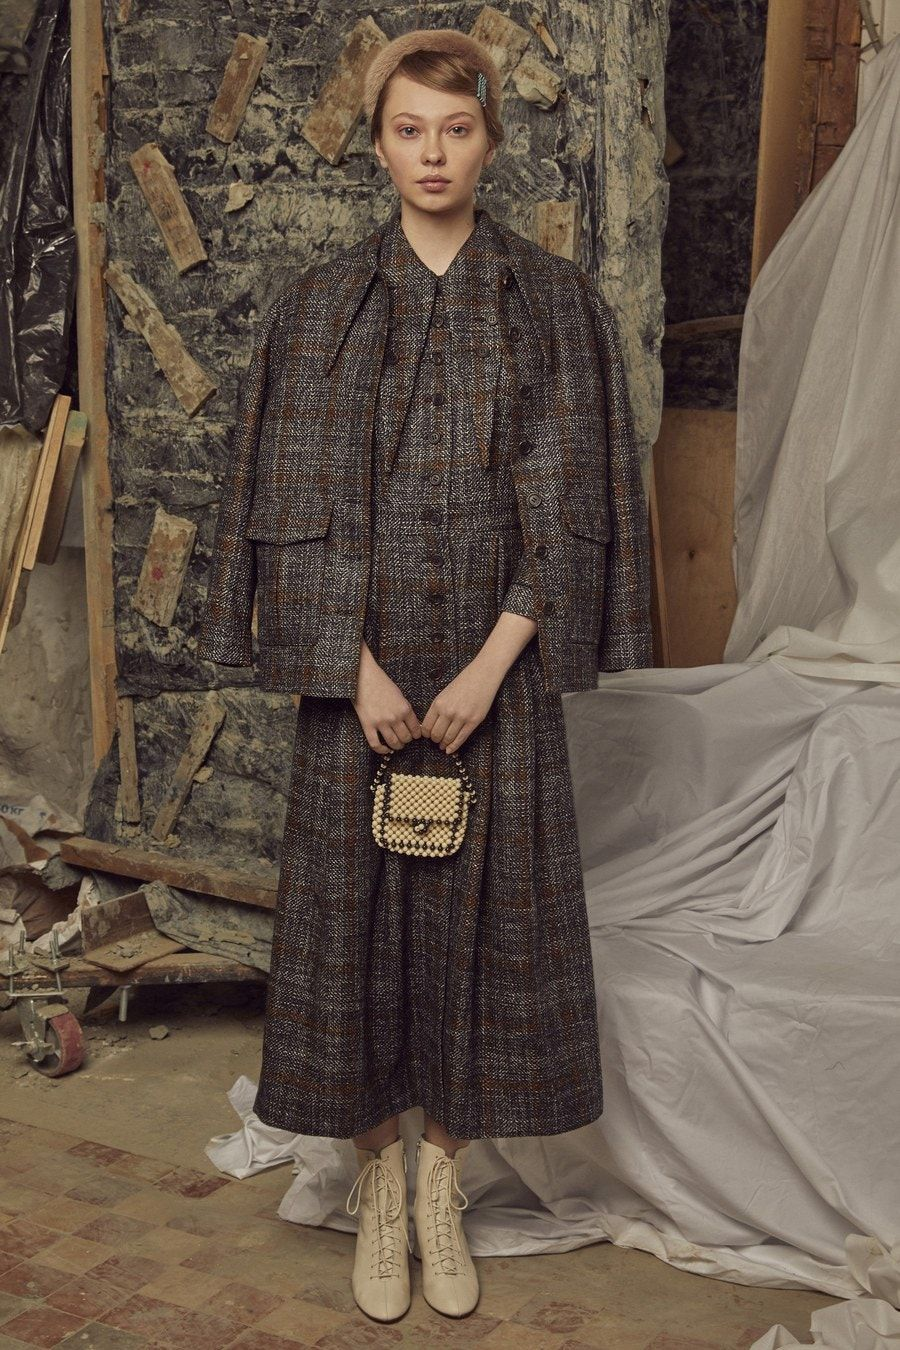 Sfilata di moda ready-to-wear autunno 2019 Alena Akhmadullina